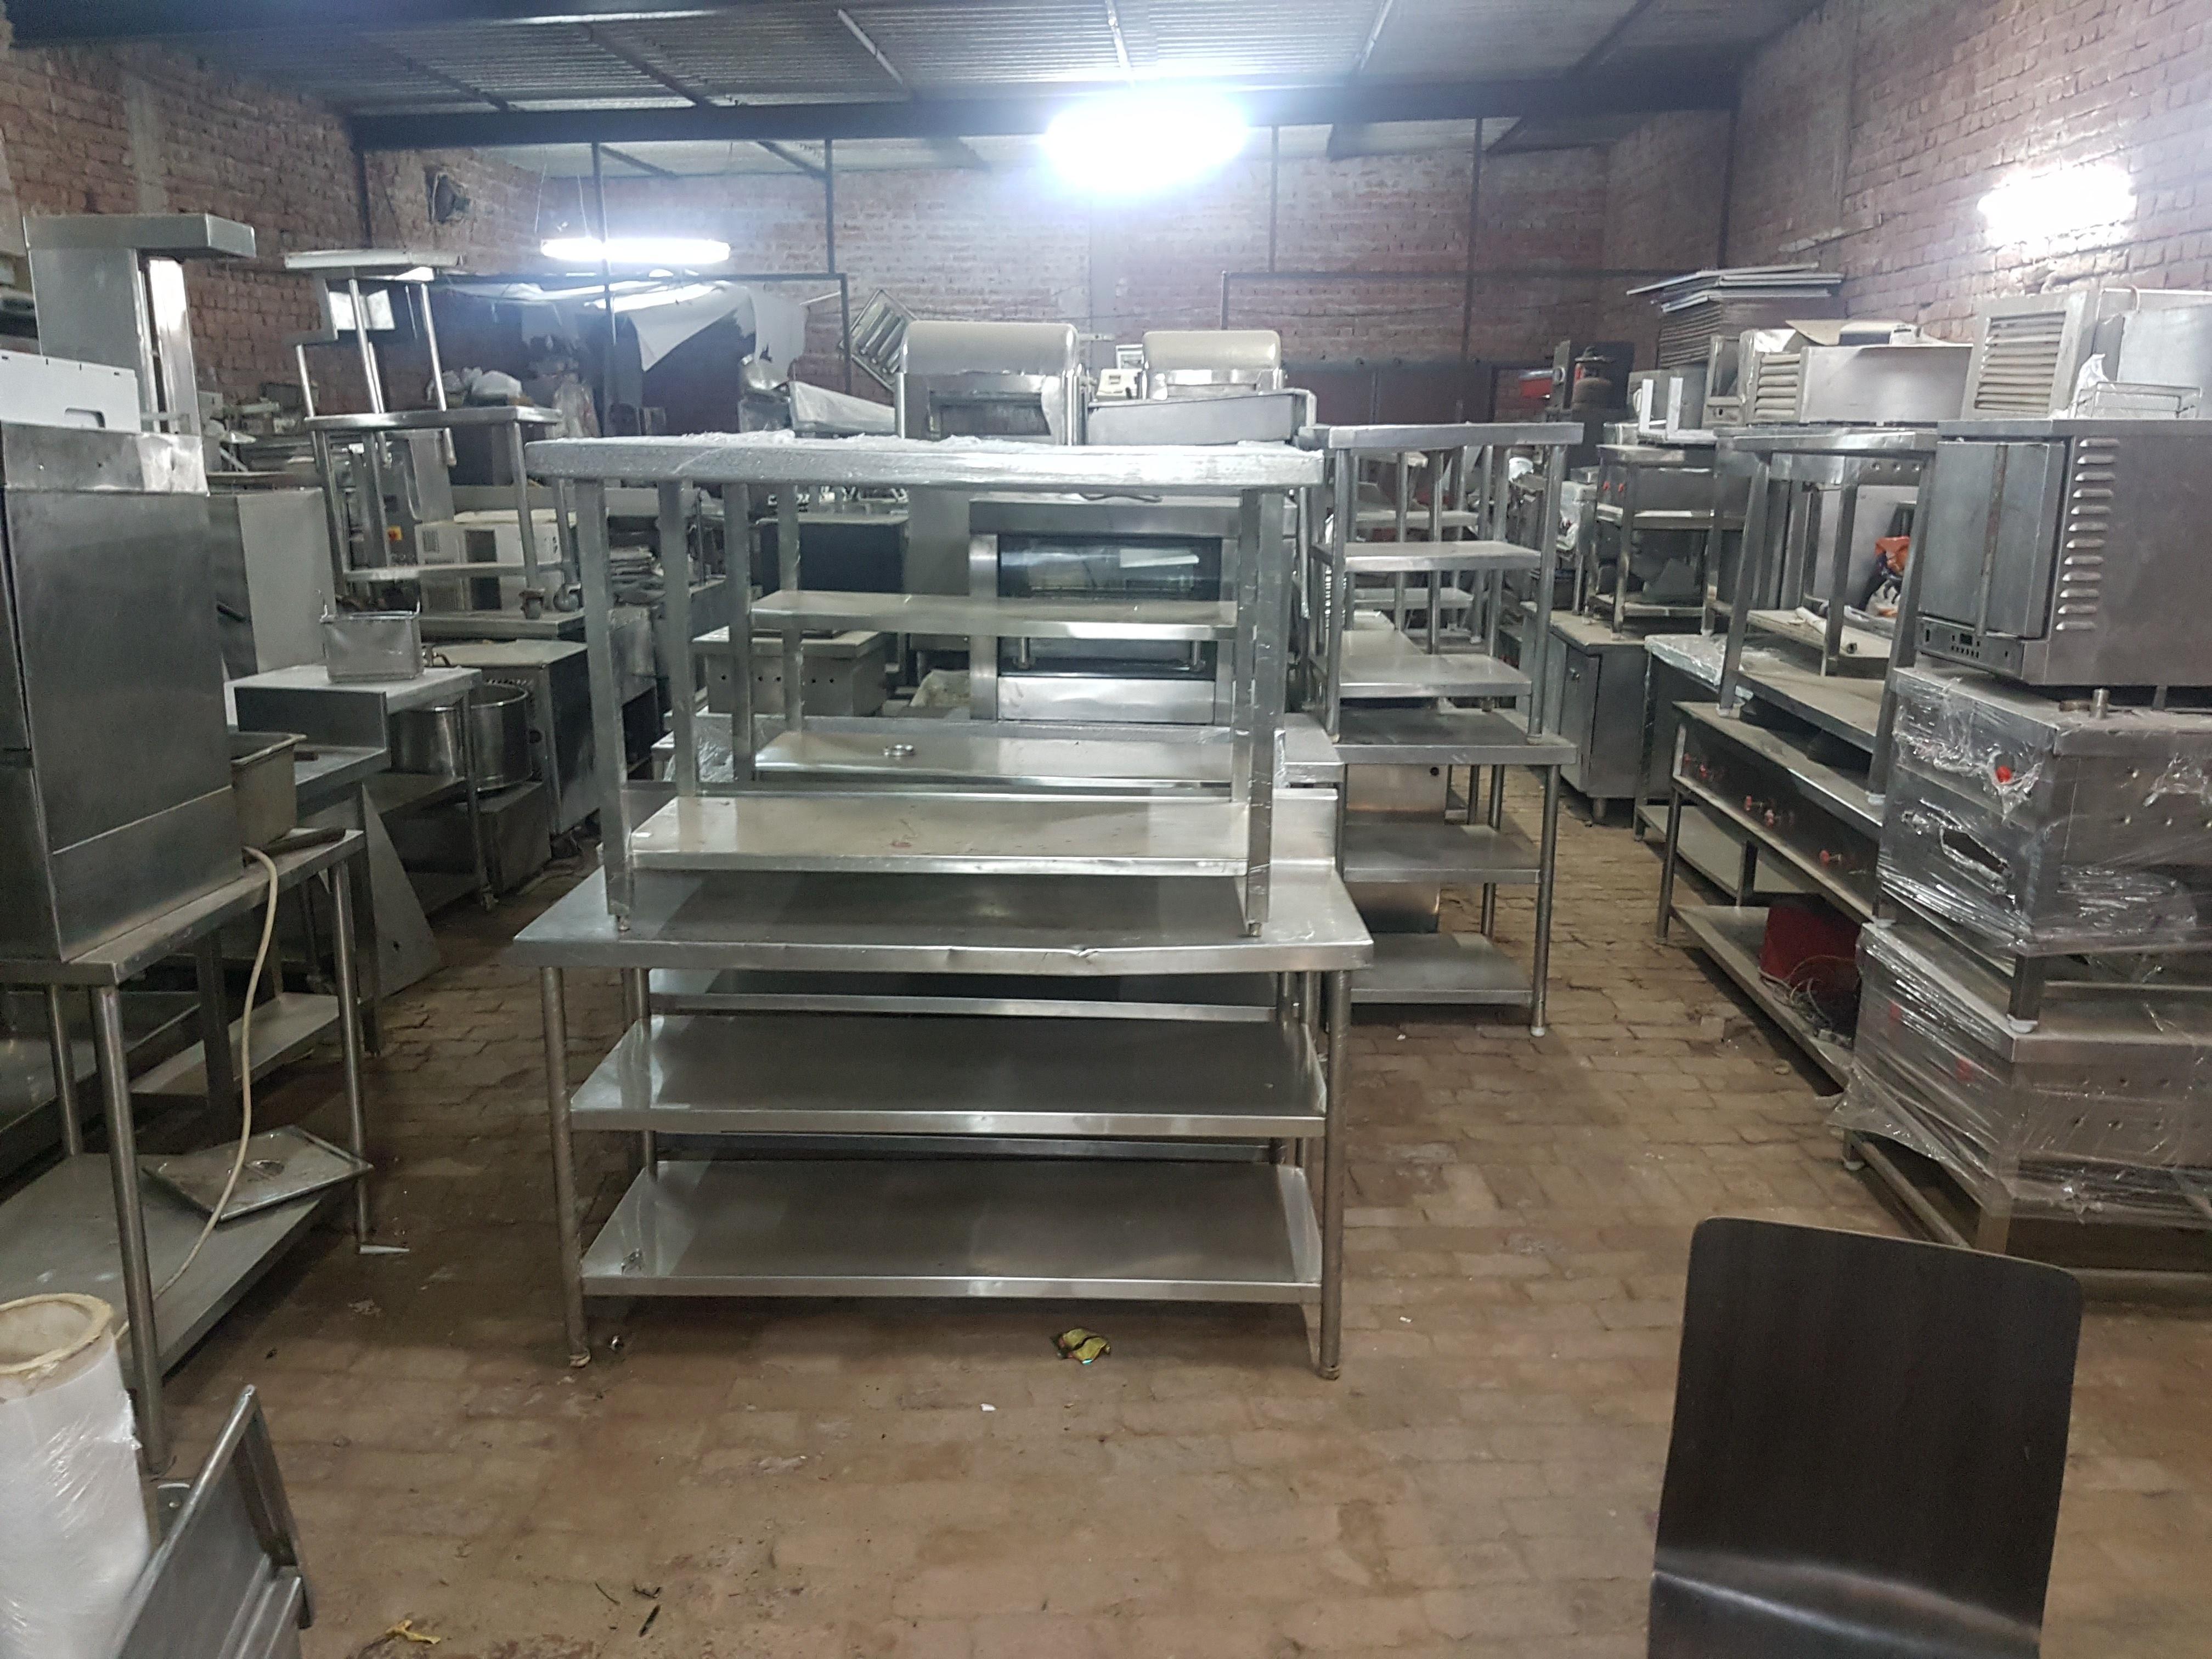 Commercial Restaurant Oven